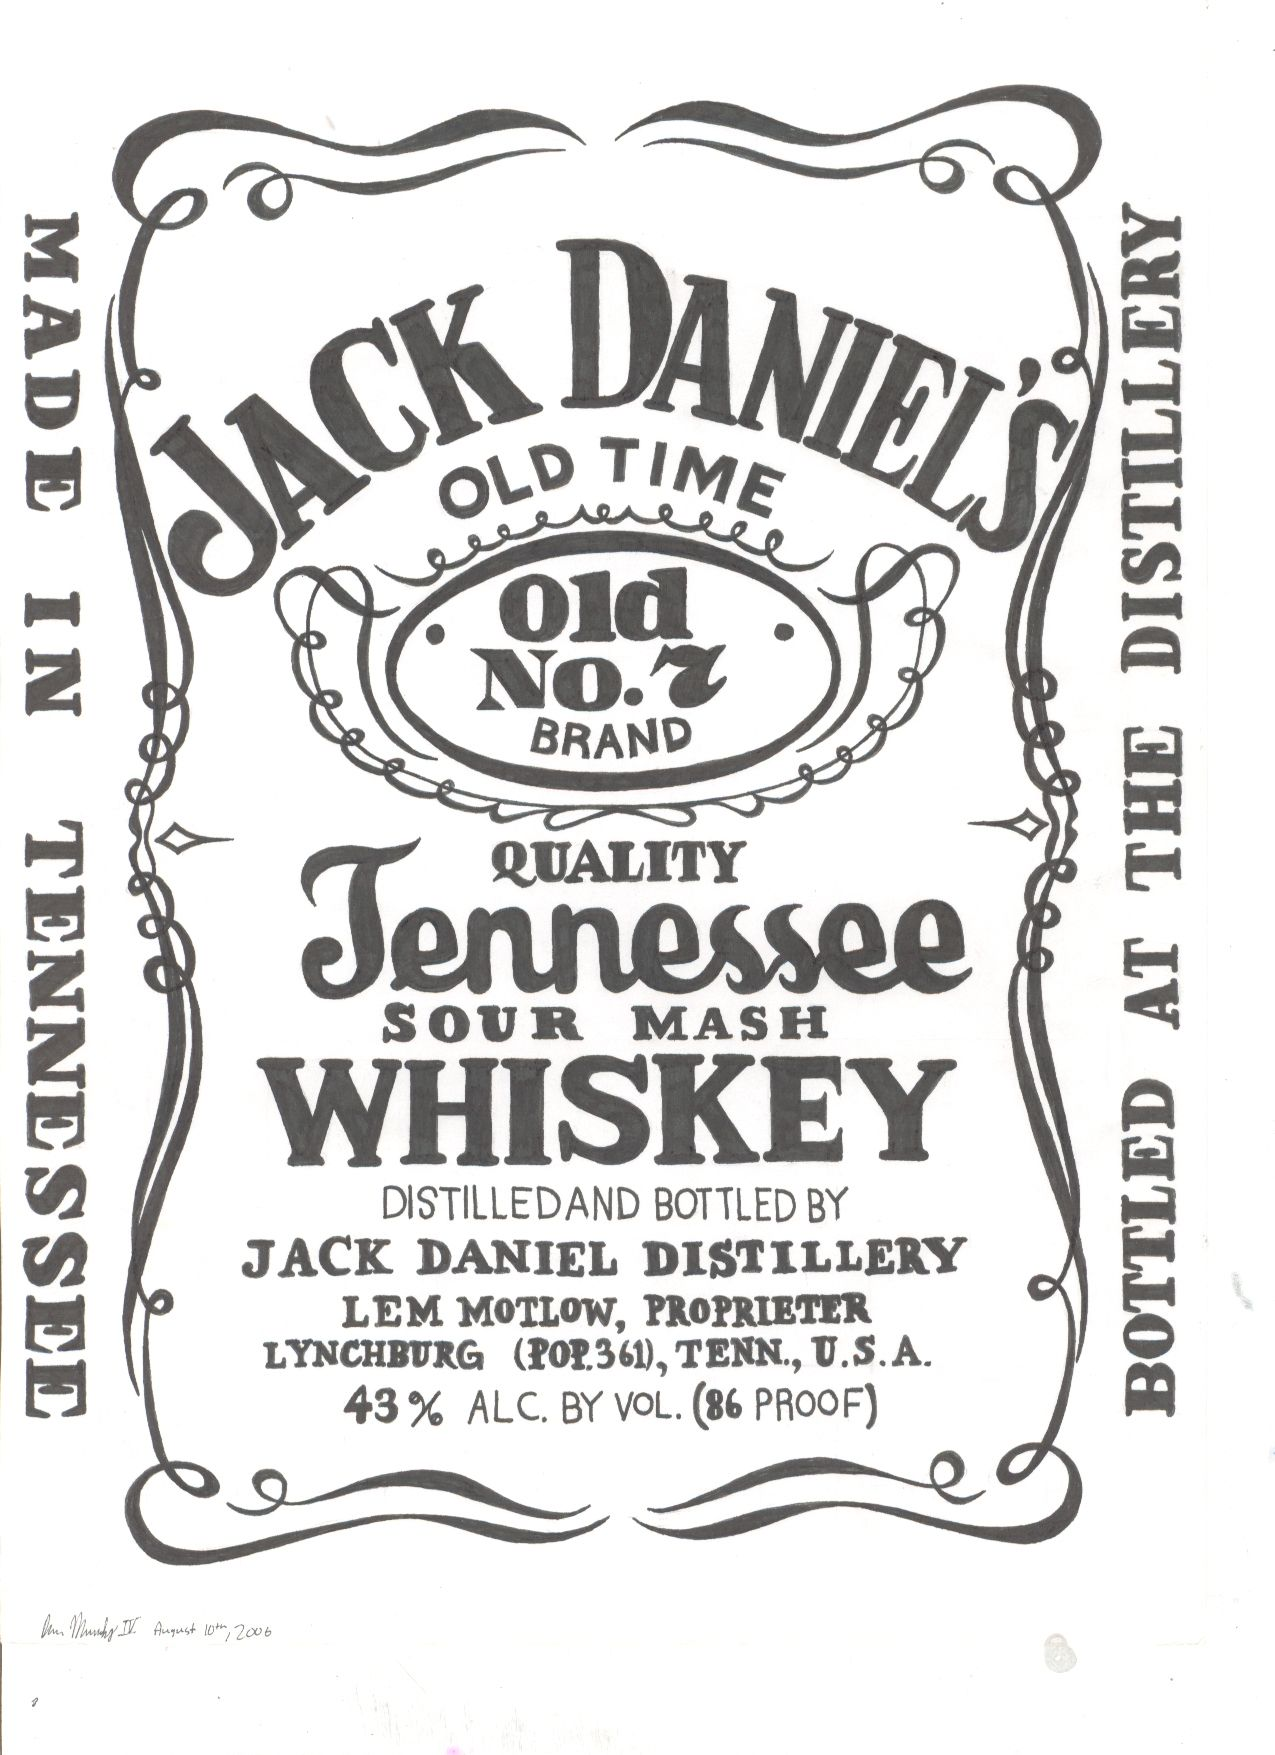 jack daniels logo stencil - Google Search | Jack Daniels ... Jack Daniels Logo Stencil